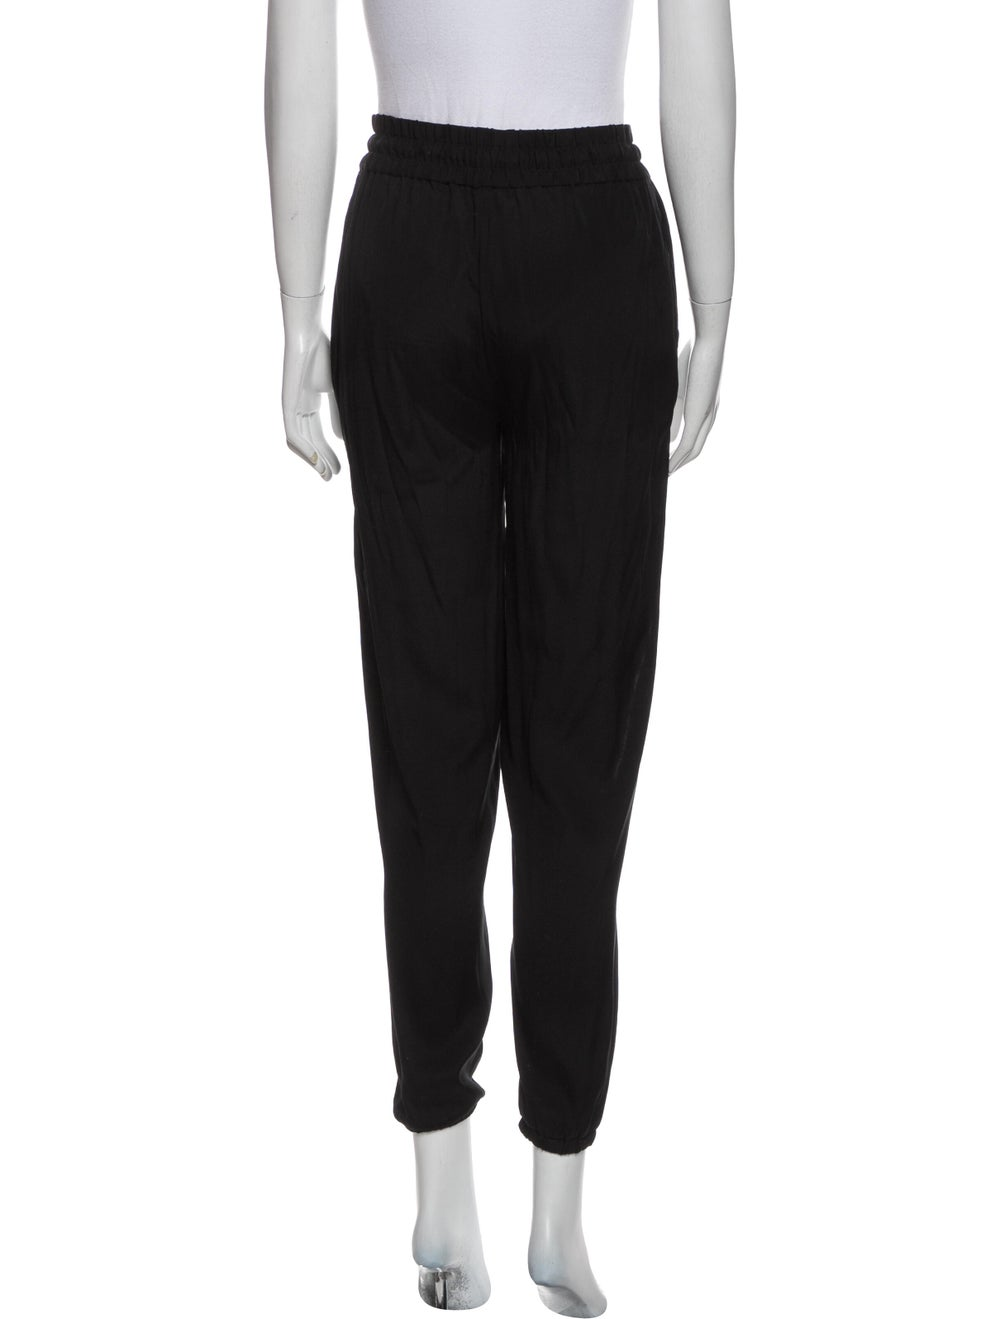 Rag & Bone Silk Sweatpants Black - image 3